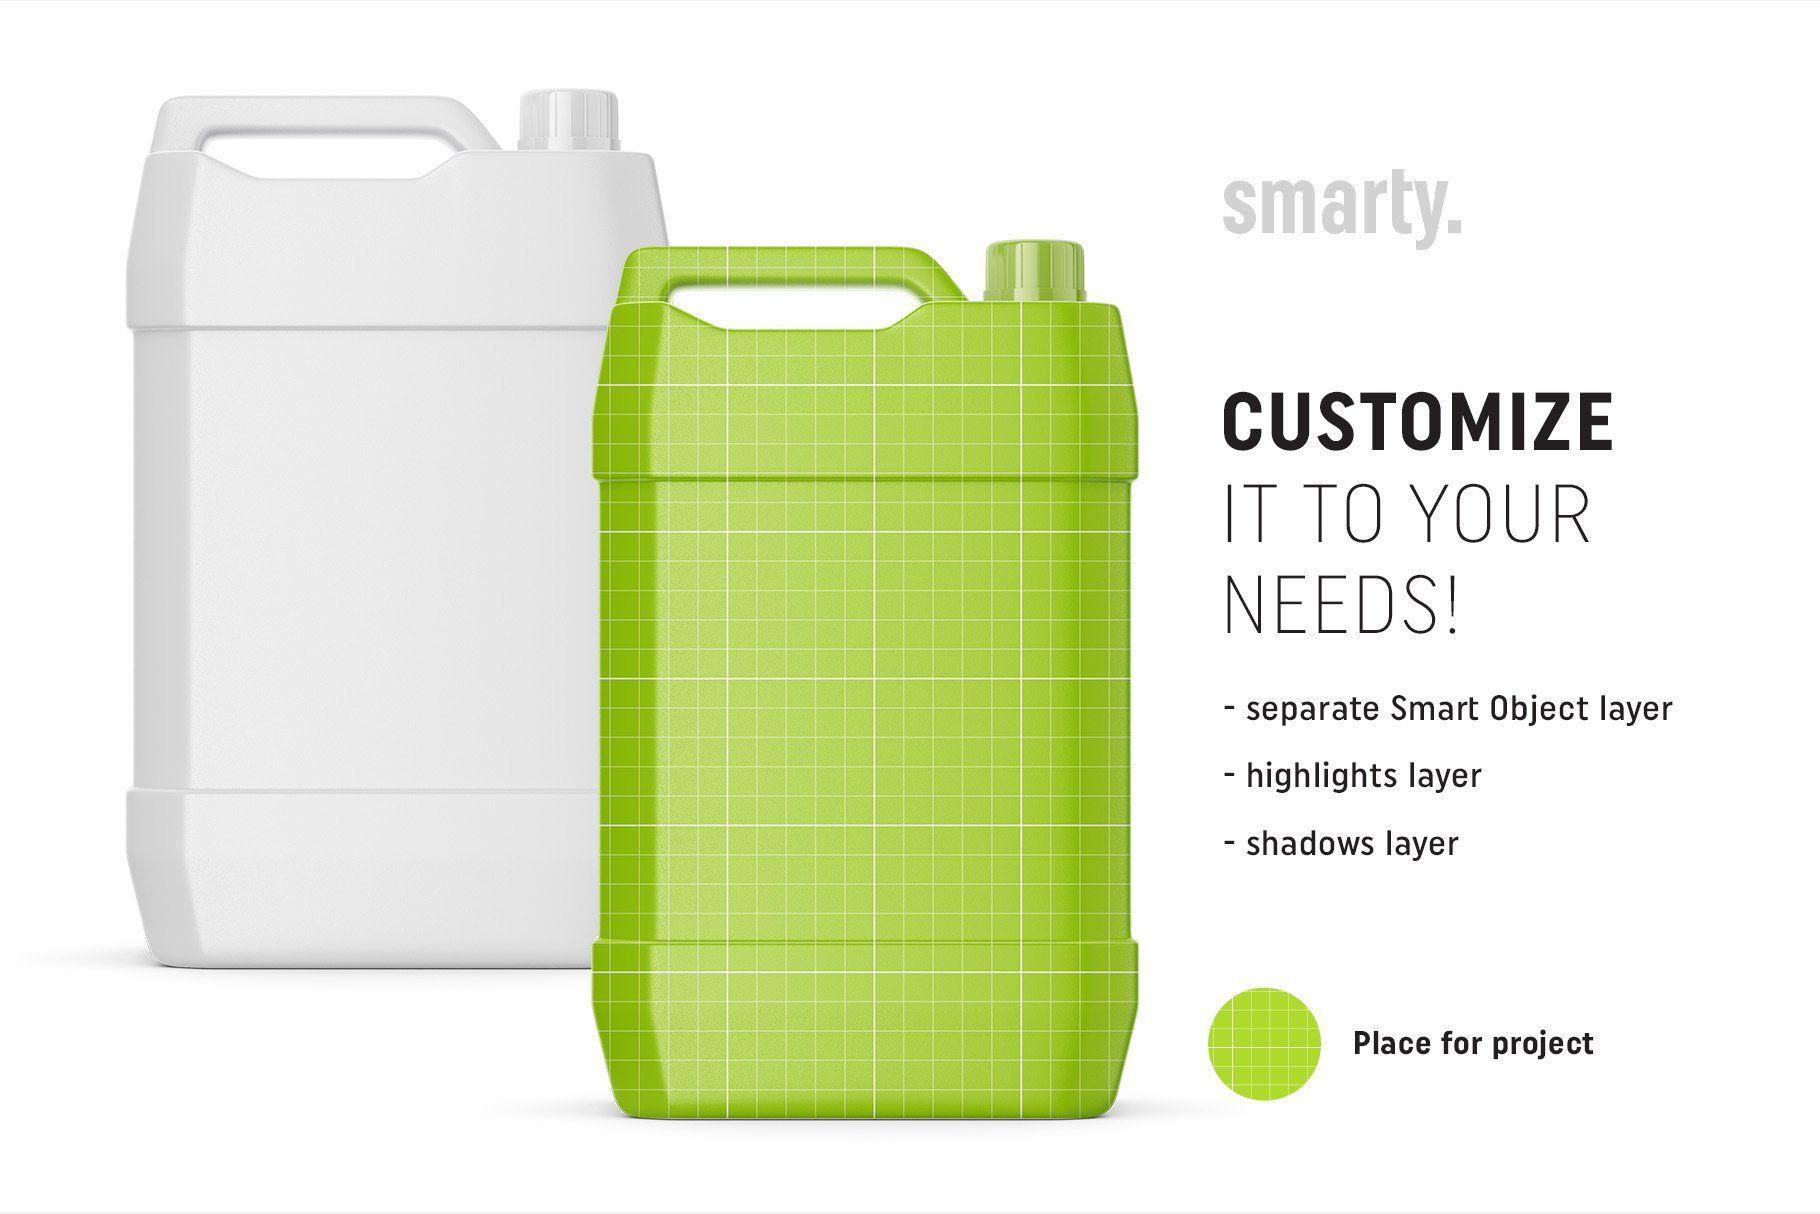 Plastic jug mockup #Ad , #AD, #Smart#Object#separate#PSD #plasticjugs Plastic jug mockup #Ad , #AD, #Smart#Object#separate#PSD #plasticjugs